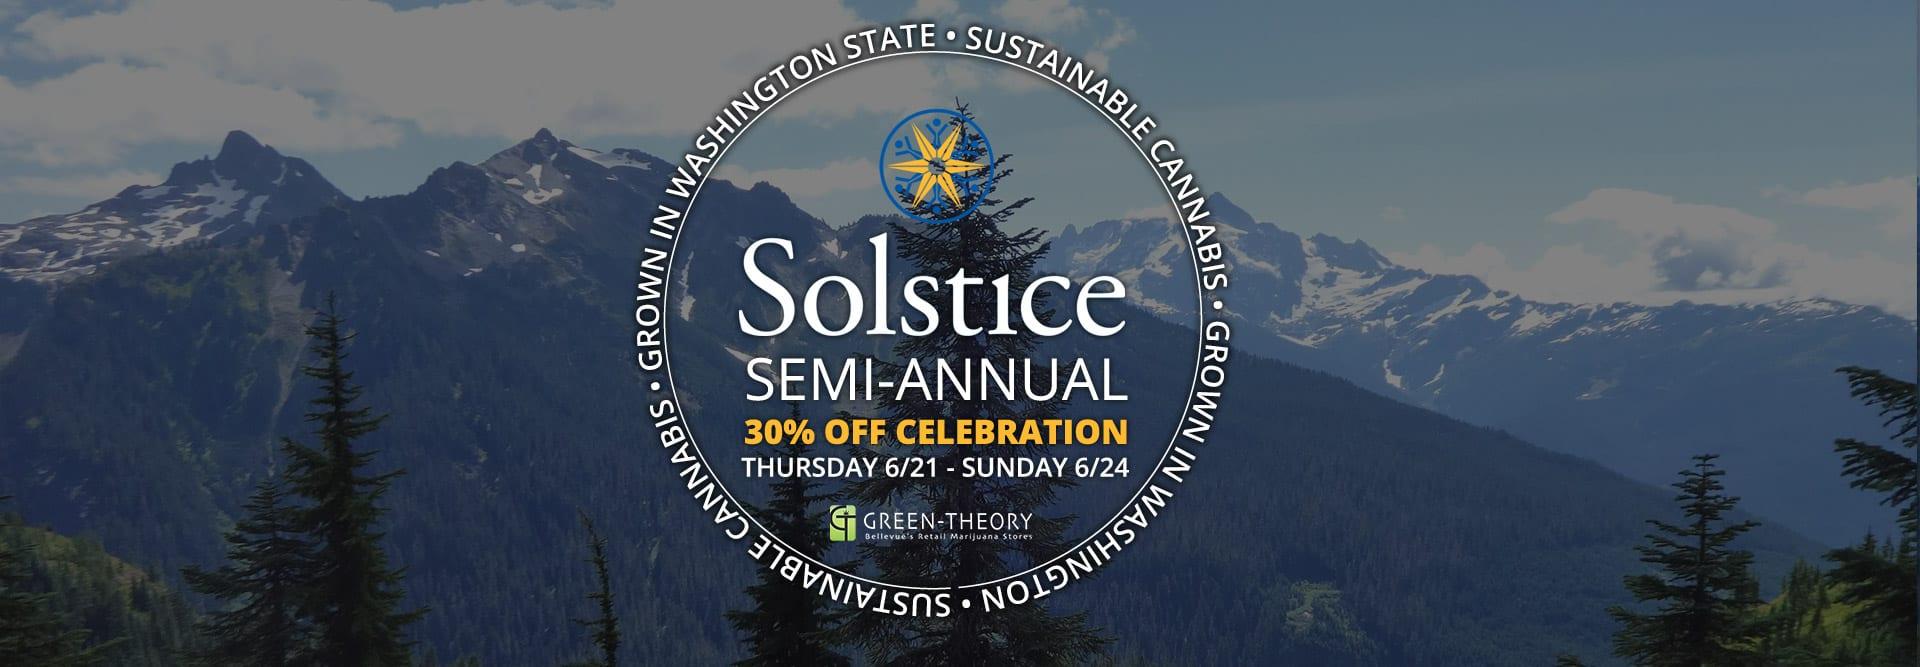 solstice-edit-slide-qc